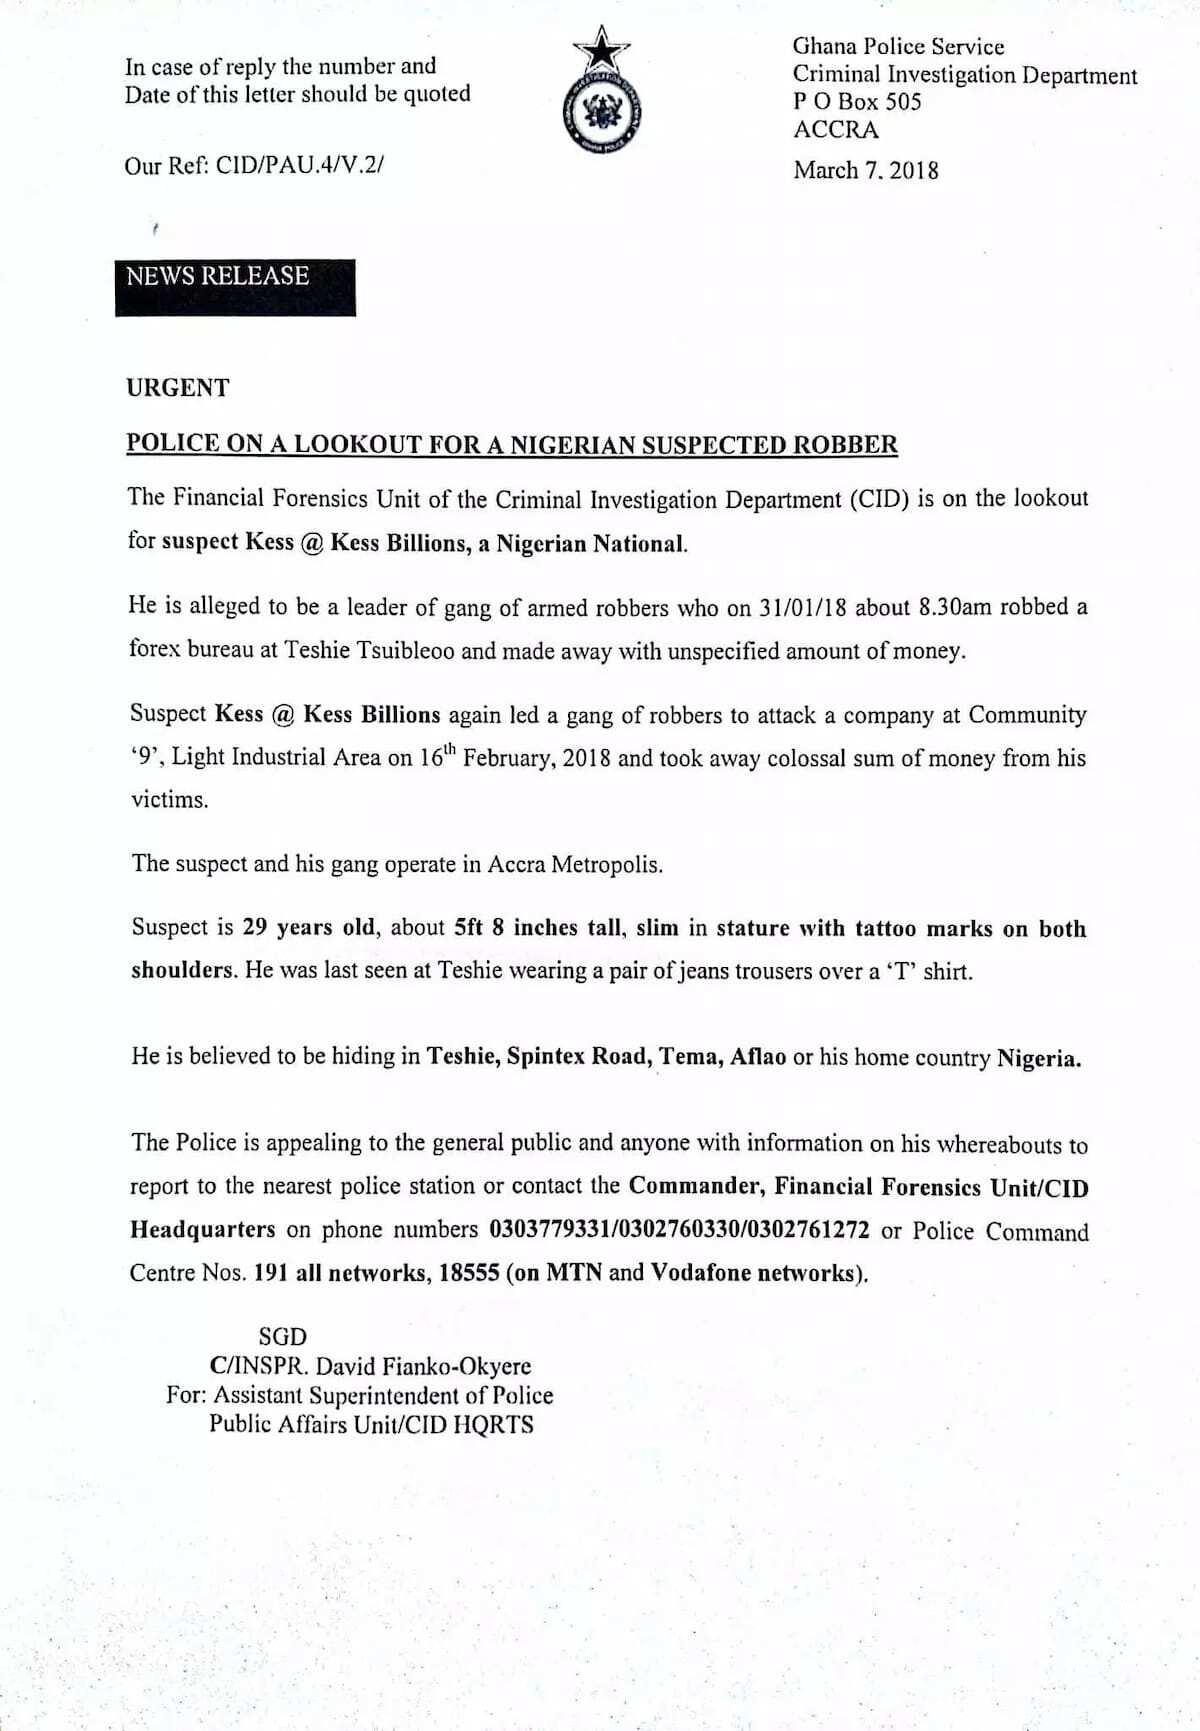 More photos of notorious Nigerian forex bureau robber hits social media